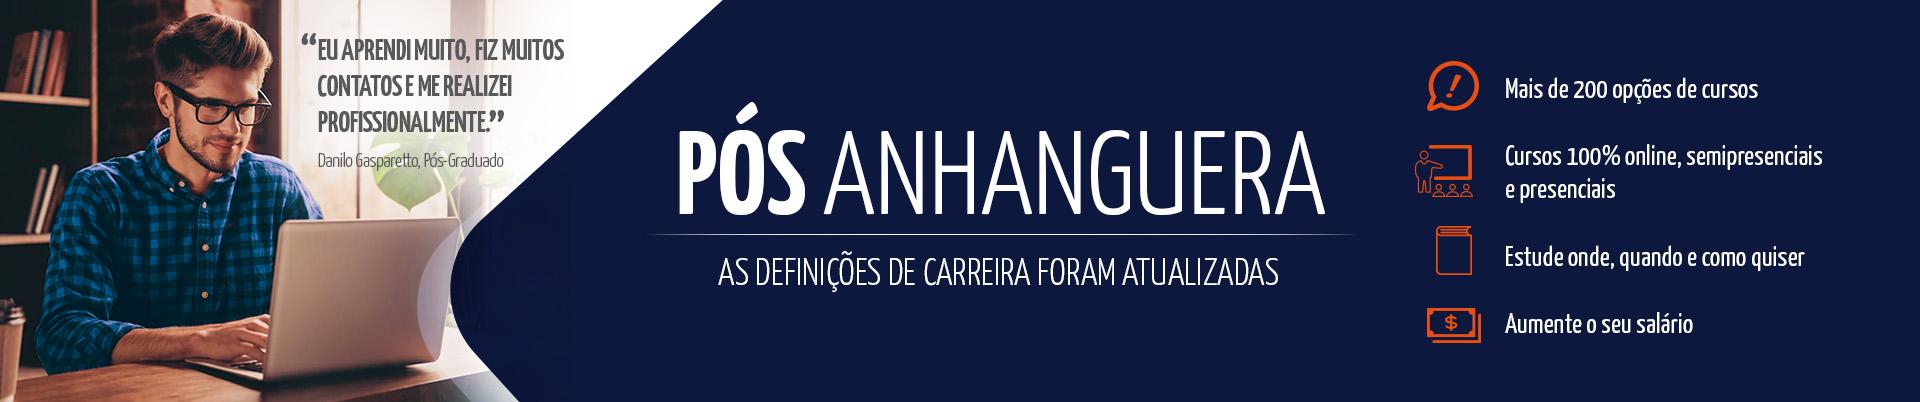 Banner Campanha